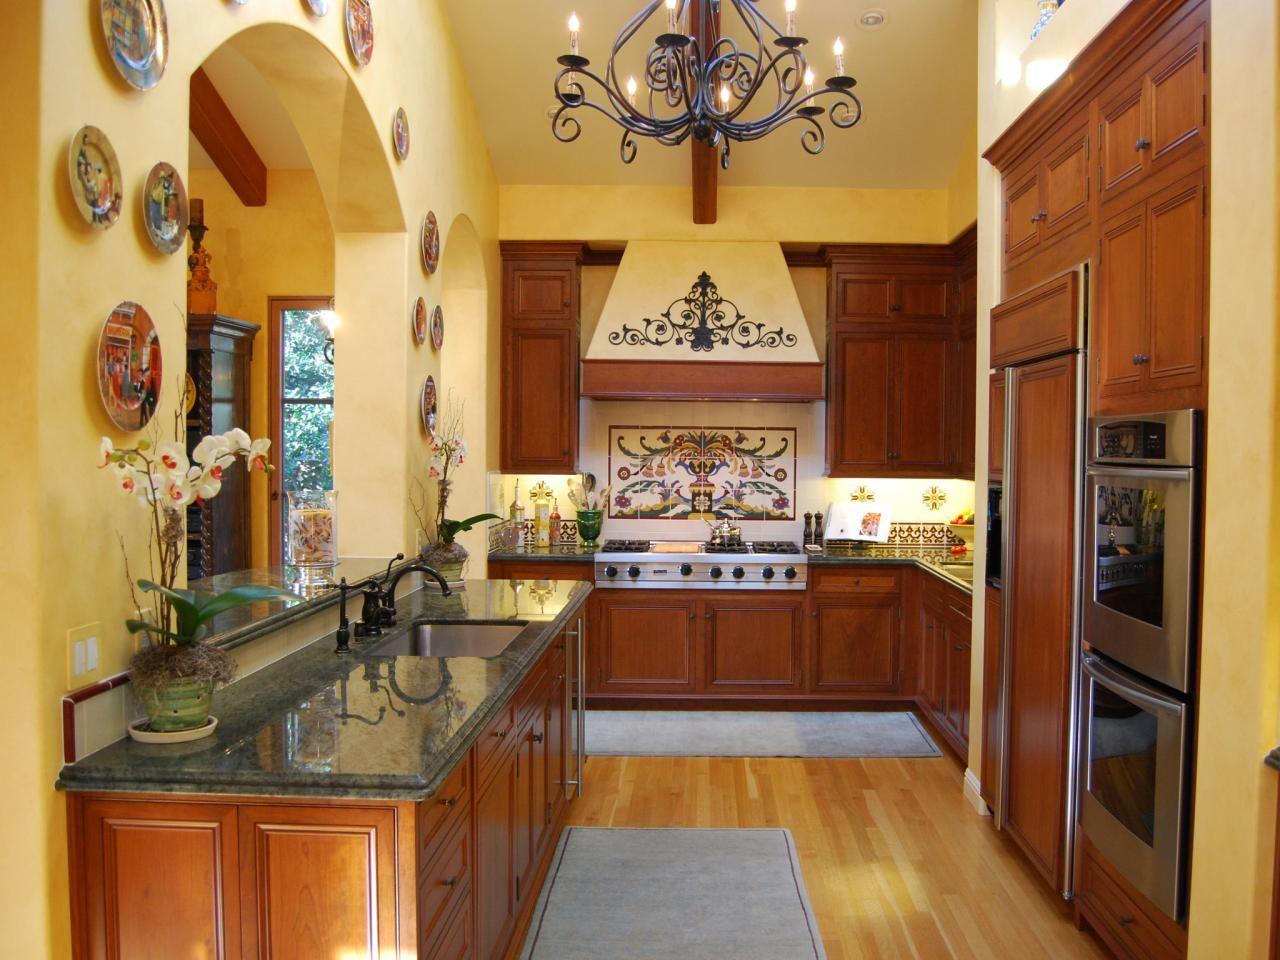 Galley Kitchen Designs For Very Small Kitchen Design Ideas And Decor Tuscan Kitchen Design Galley Kitchen Design Tuscan Kitchen